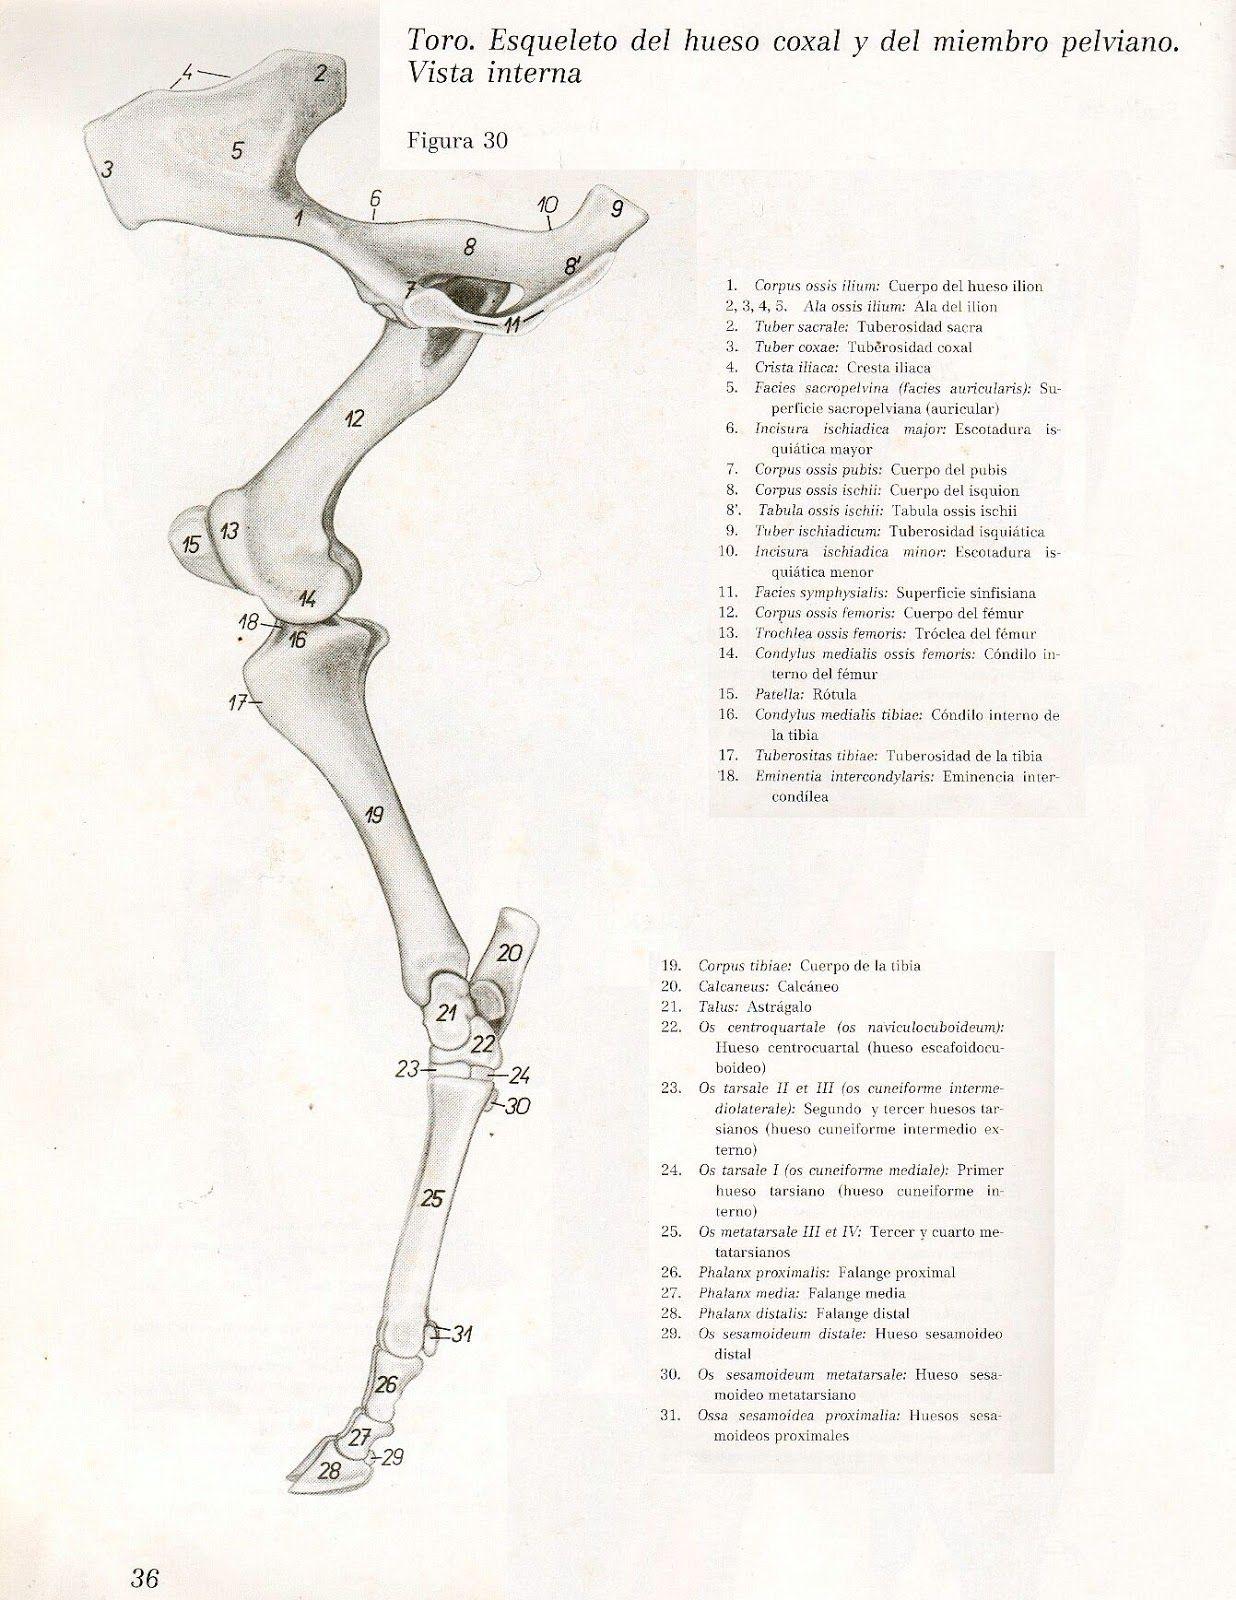 Anatomia Veterinaria: Miembro Pelviano (Toro) | Anatomia Animal ...